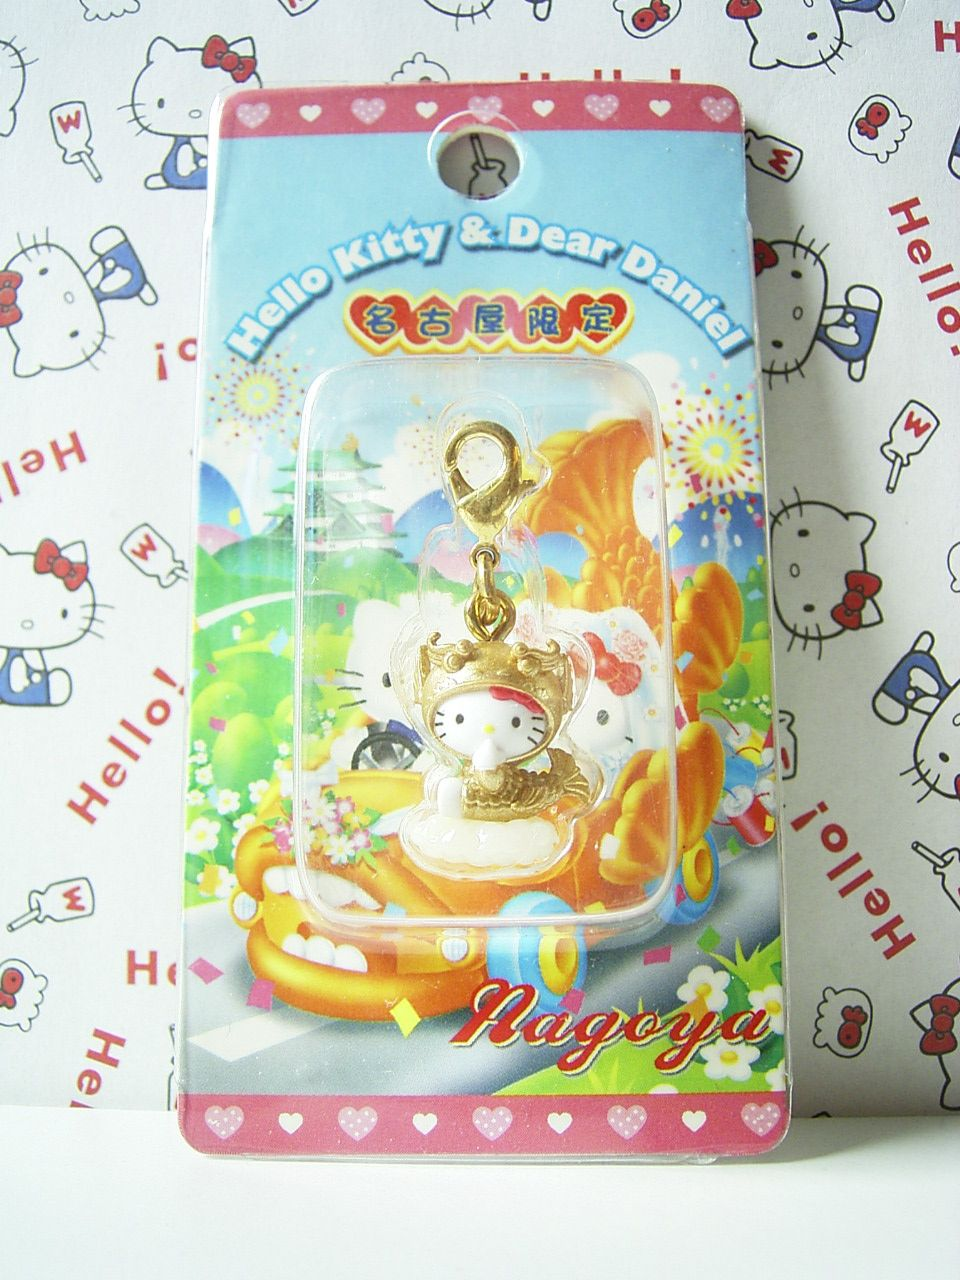 HELLO KITTY GOTOCHI Mascot Figure Charm NAGOYA JAPAN Only! Sanrio 2003 NEW 1.6cm 16.99